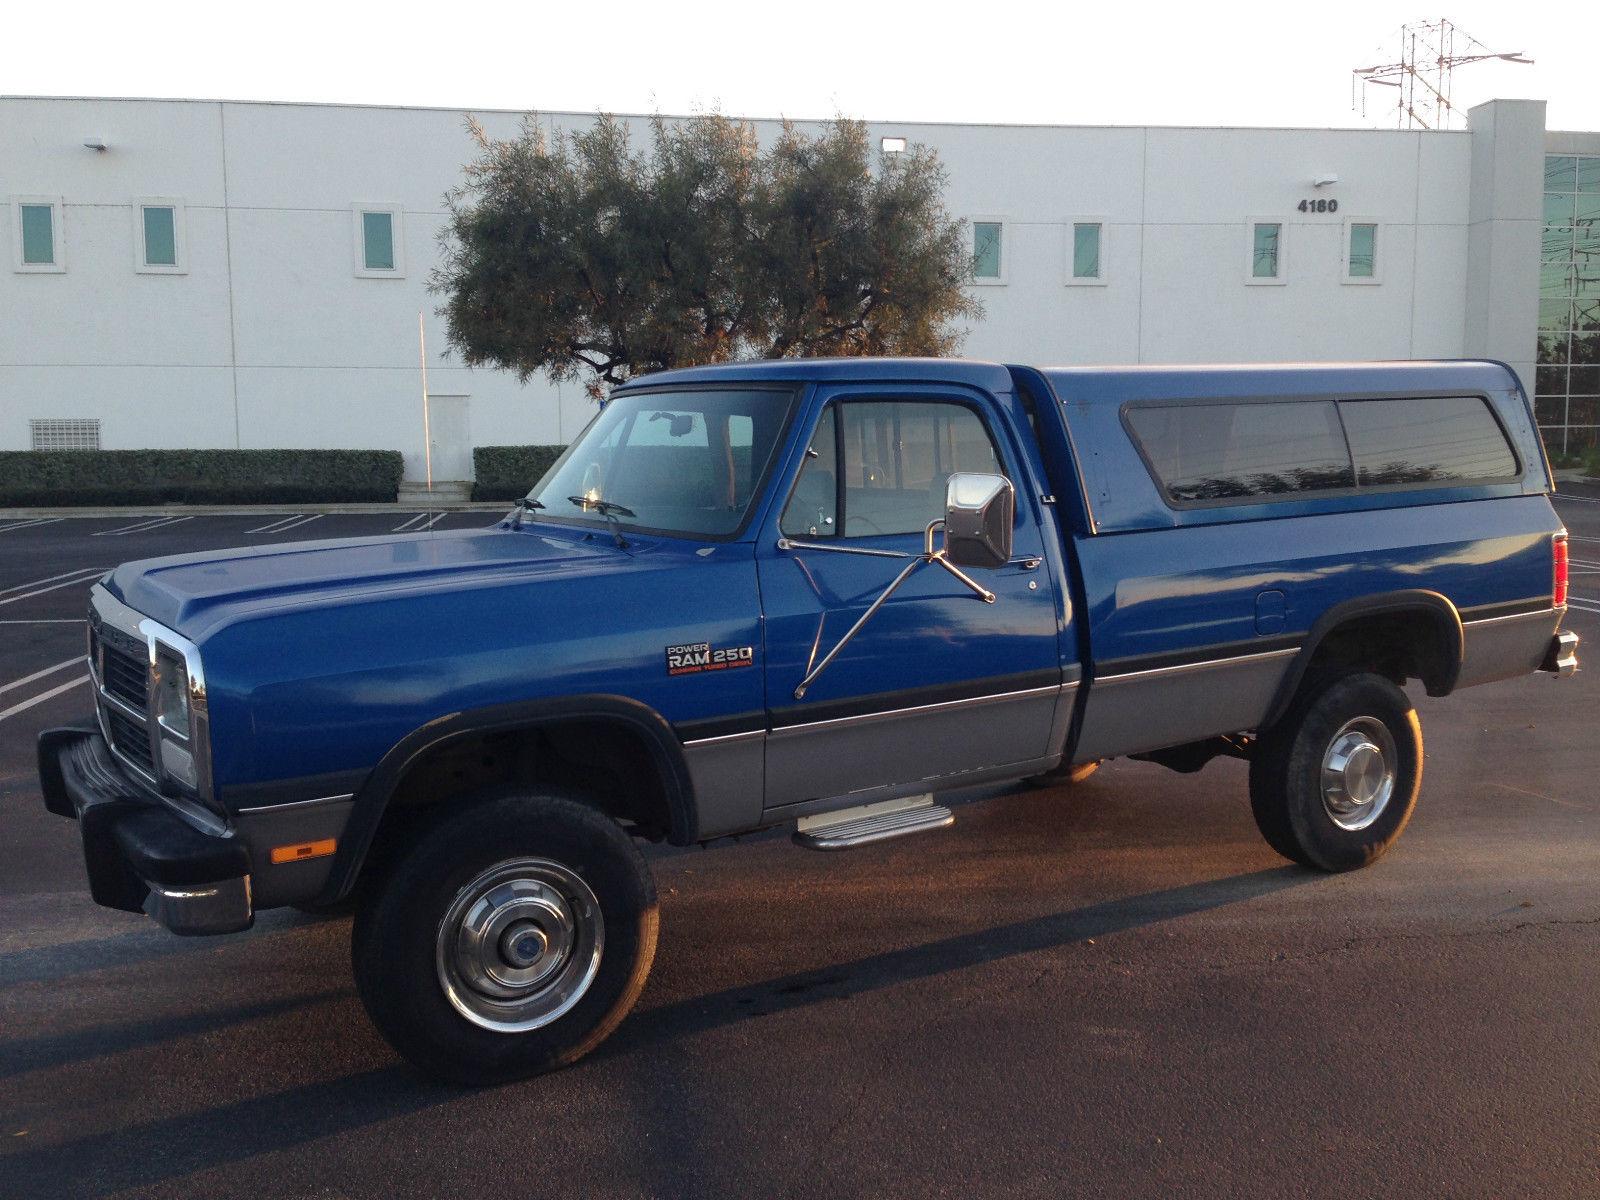 Dodge Ram 2500 Cummins Turbo Diesel For Sale